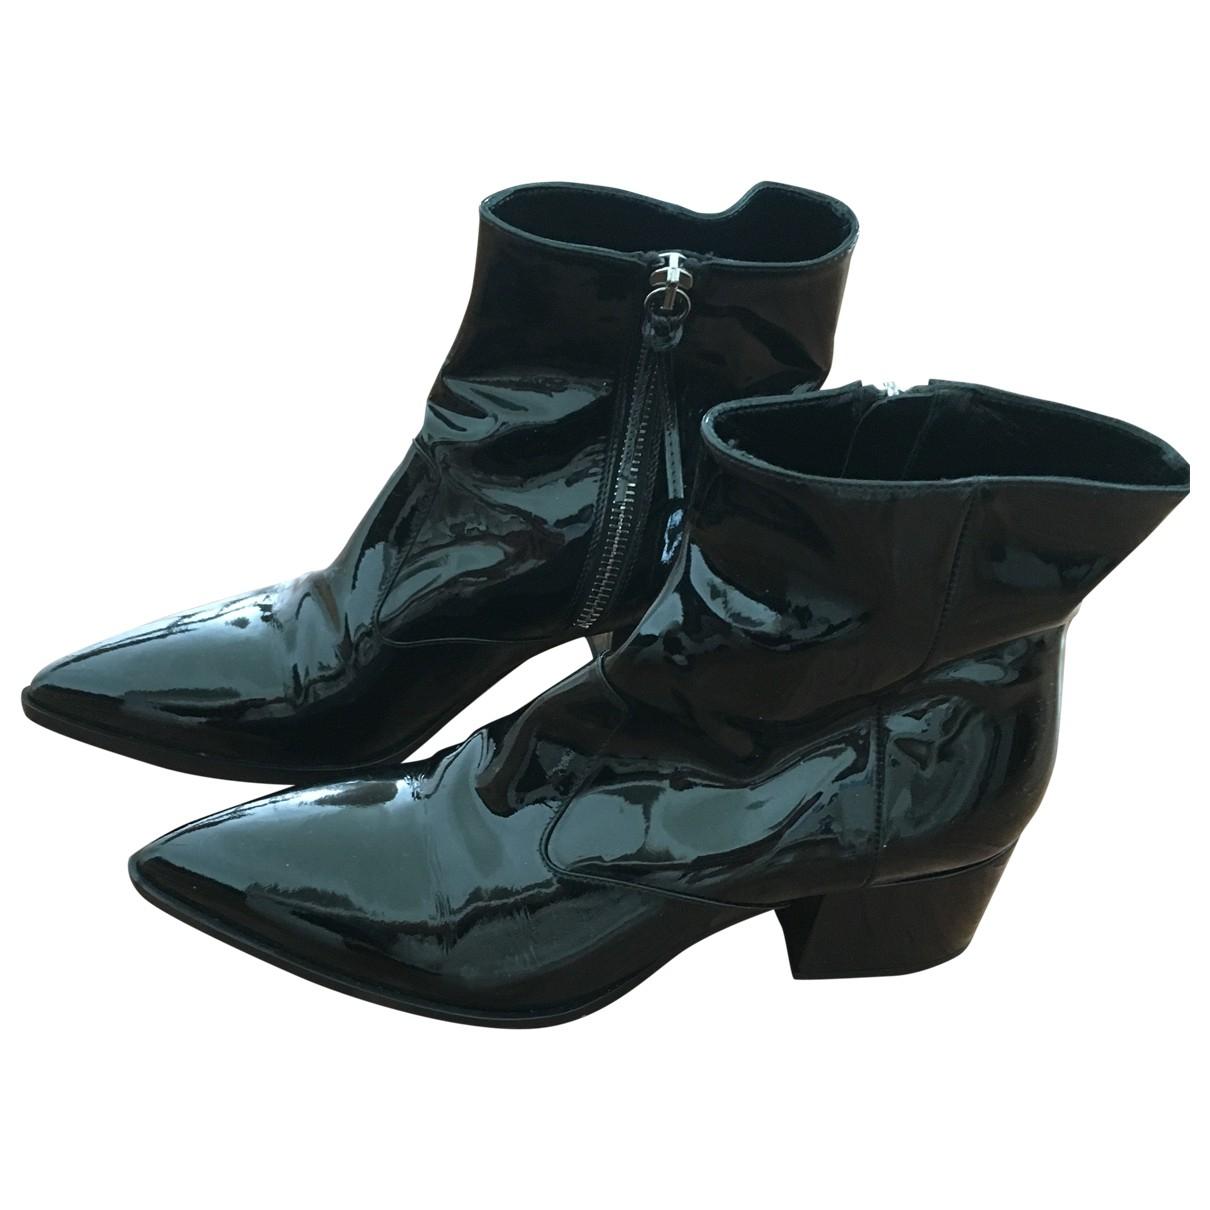 Miu Miu \N Black Patent leather Ankle boots for Women 34.5 EU